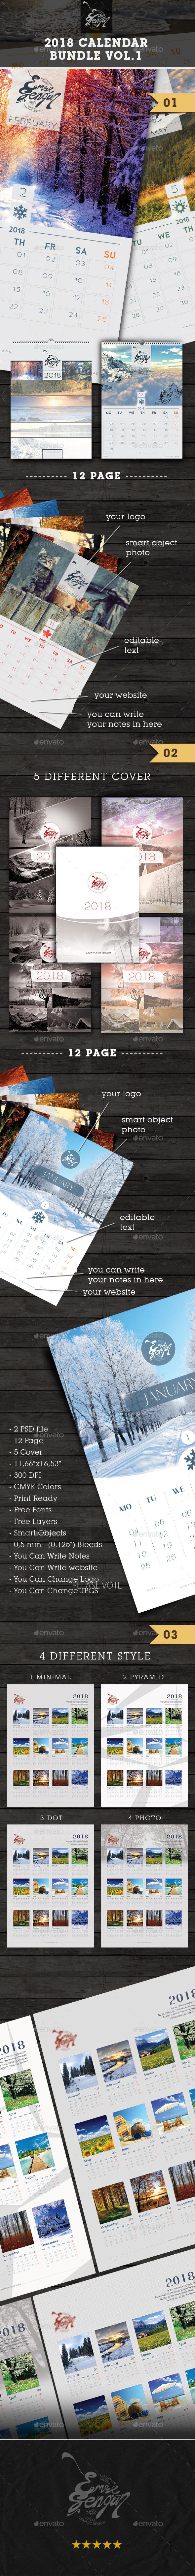 GraphicRiver 2018 Calendar Box Bundle Vol.1 20904526